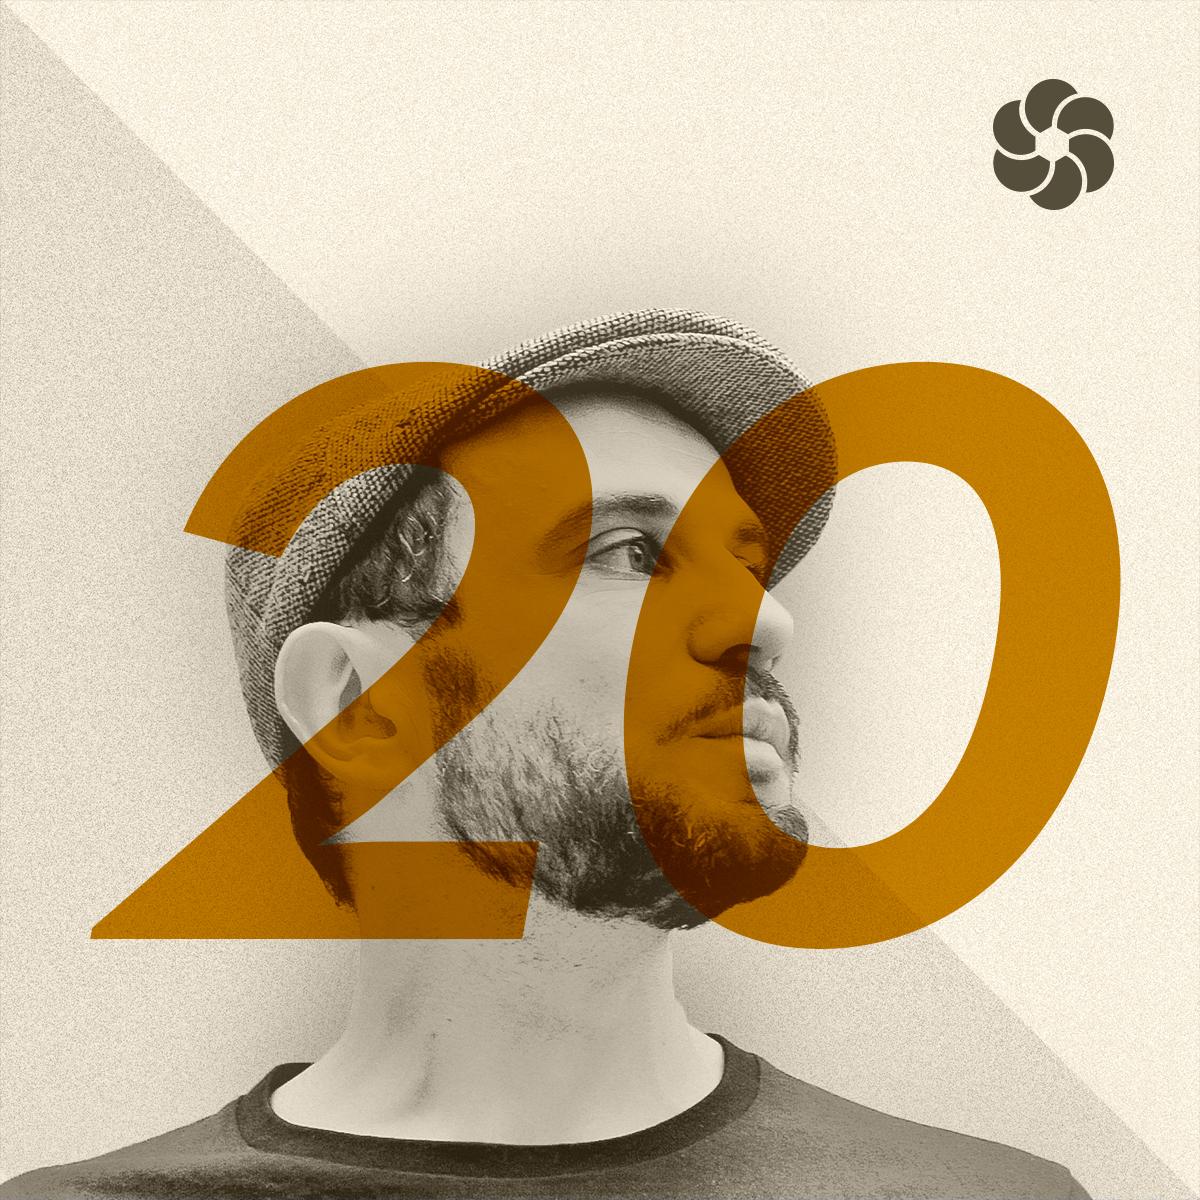 PHNLV020 – Julien Lebrun